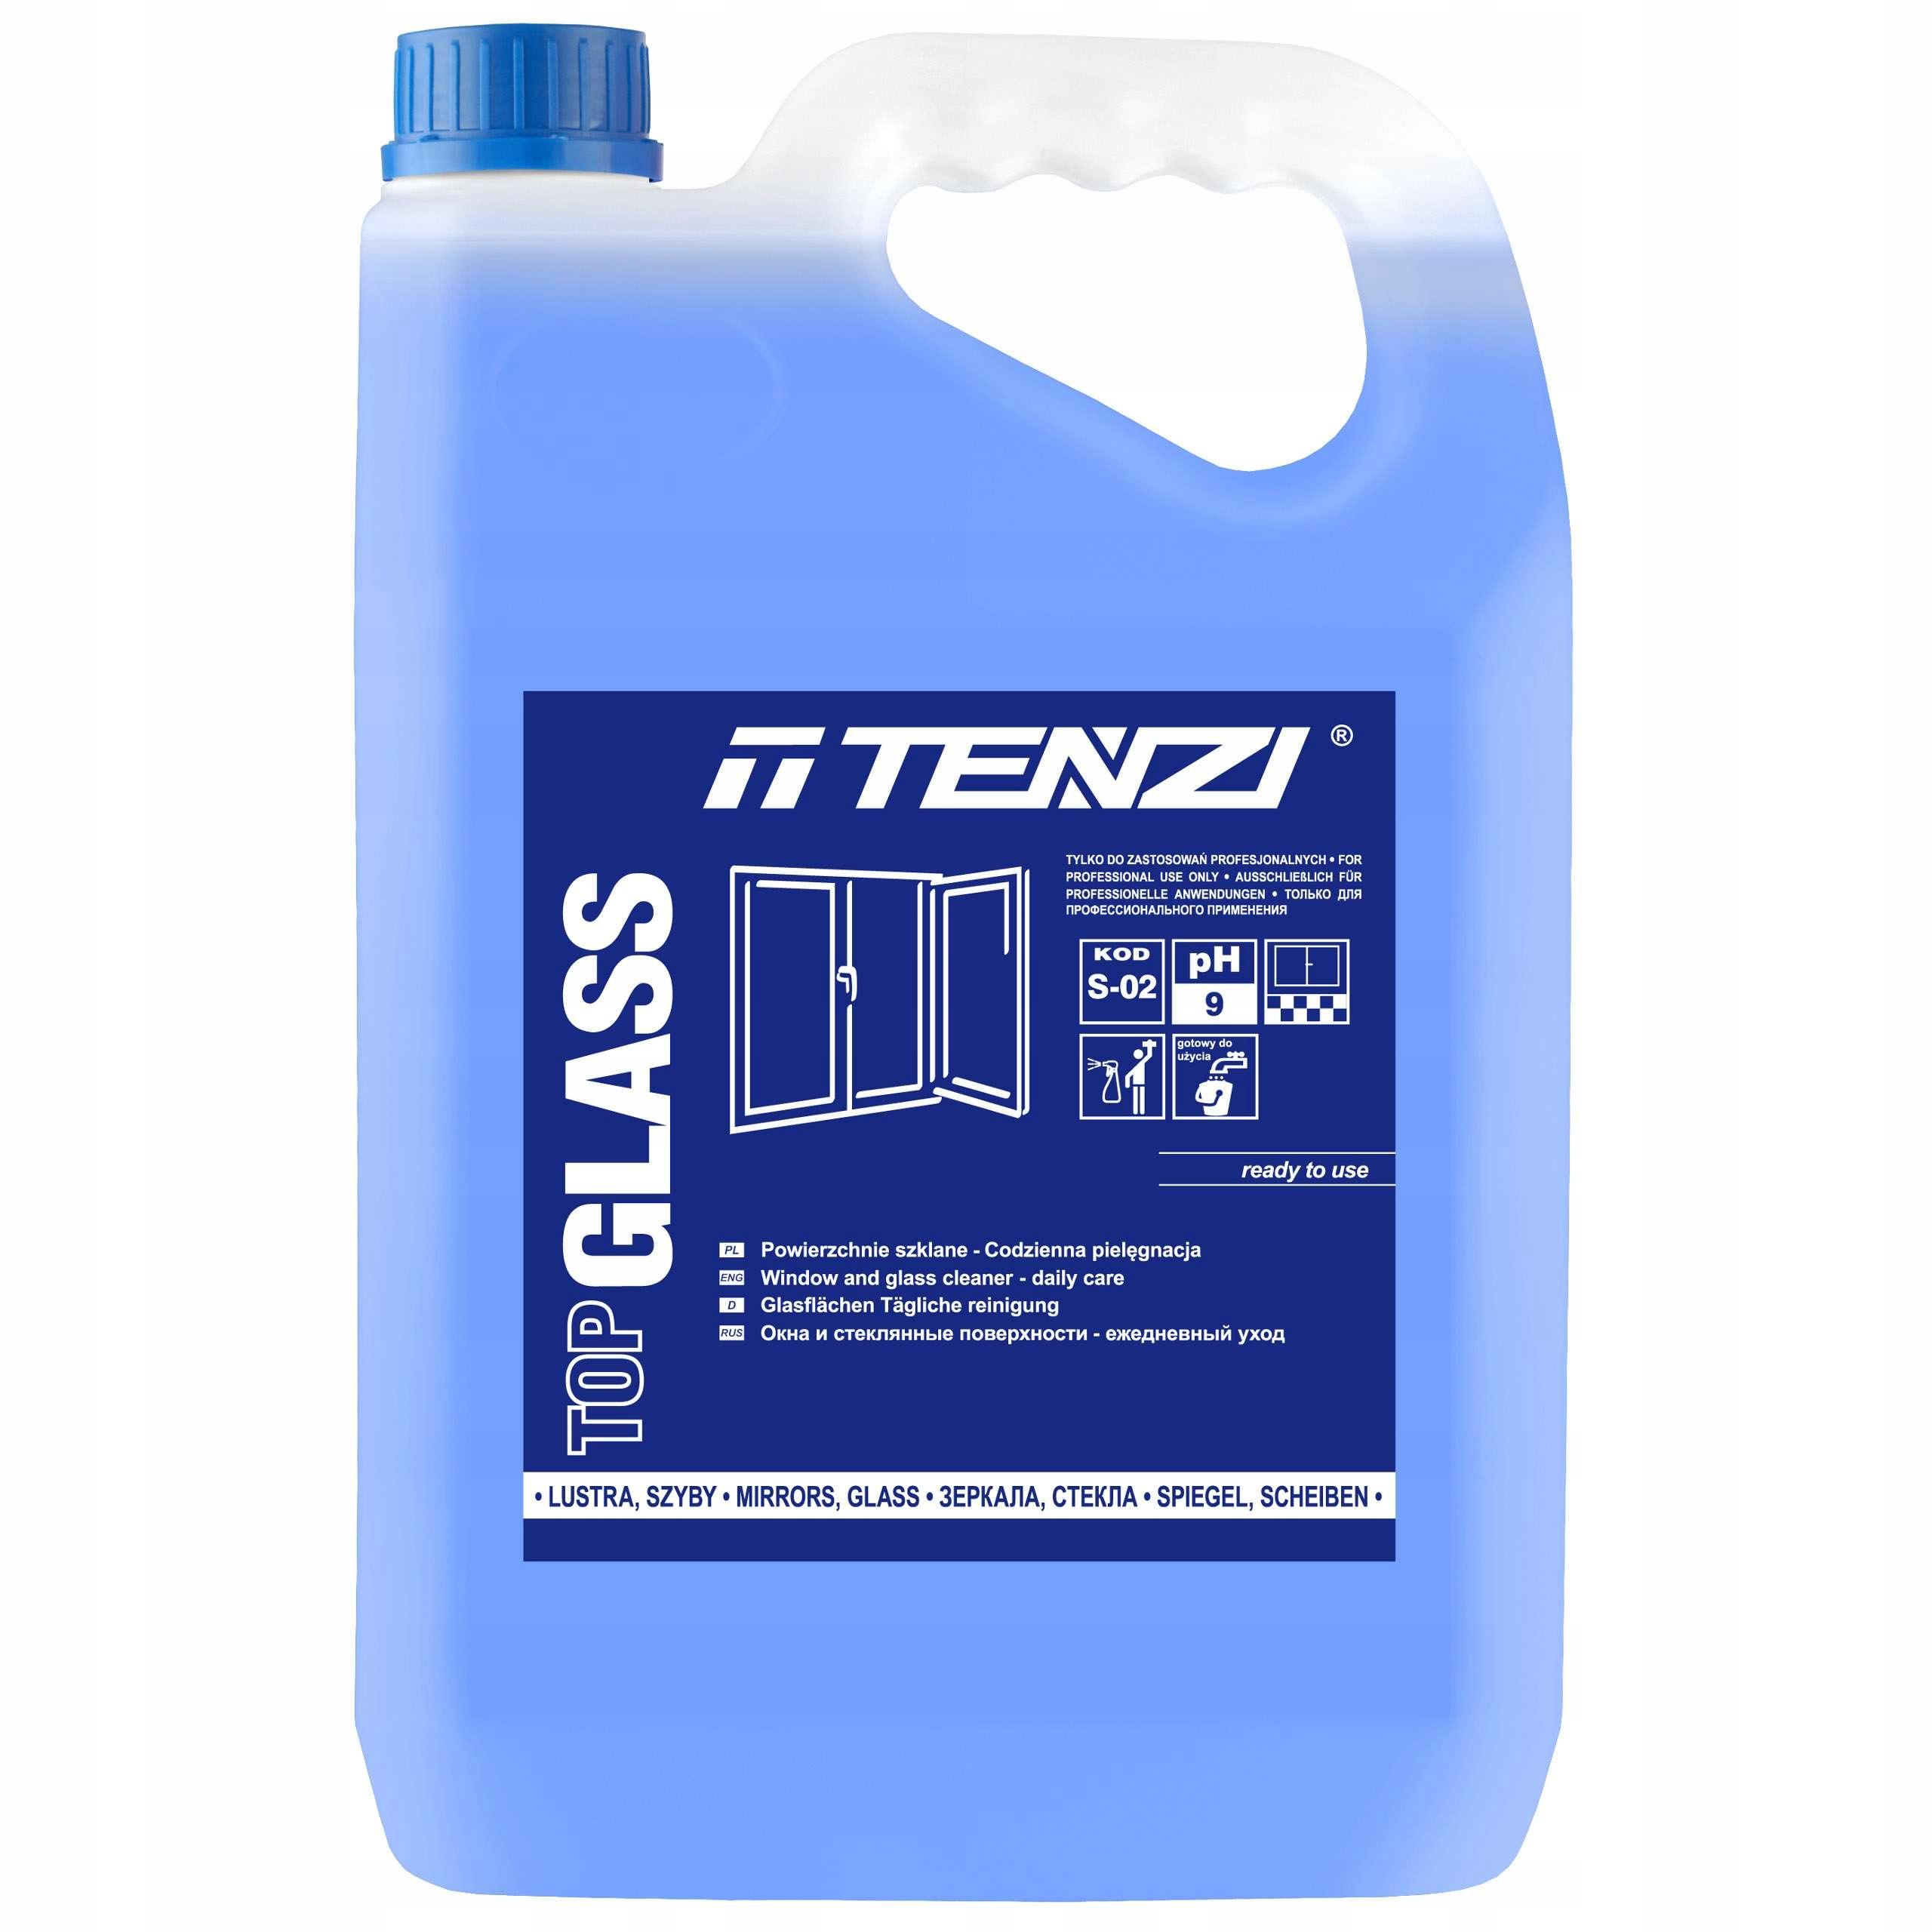 Tenzi Top Glass, Жидкость для мытья стекол, зеркал стекла 5Л